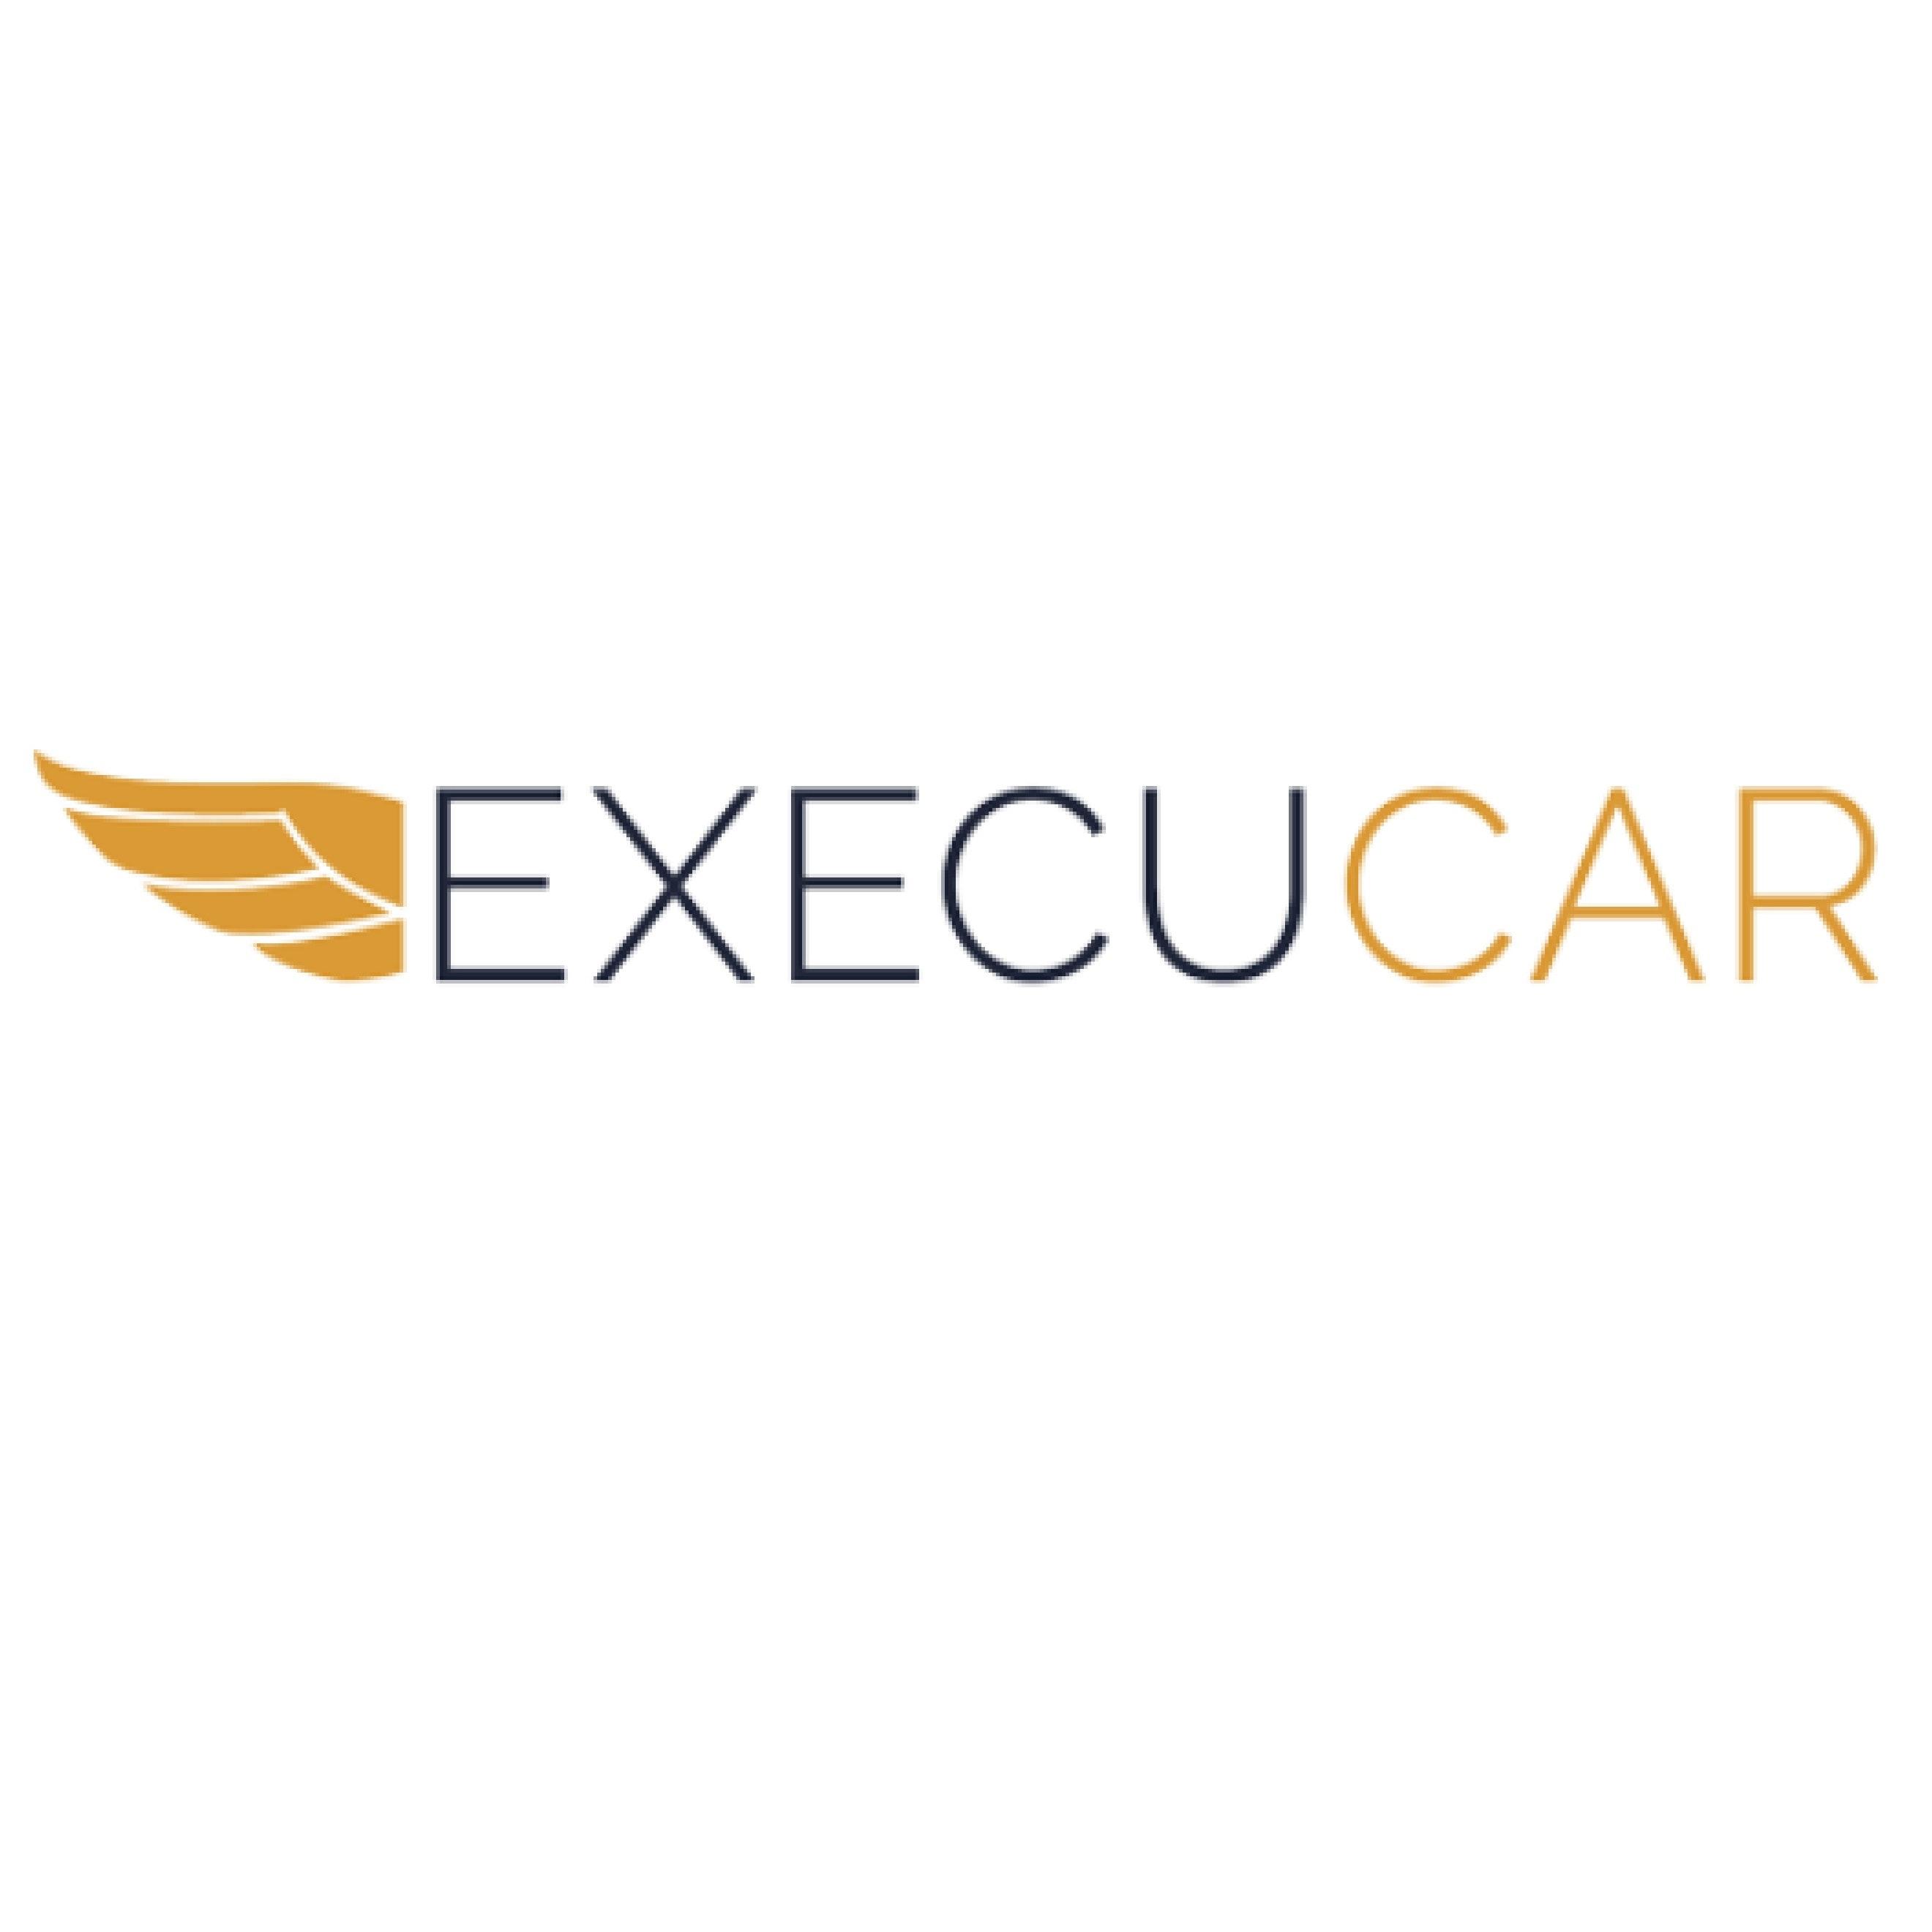 Execucar - Premium Sedan, Curbside logo